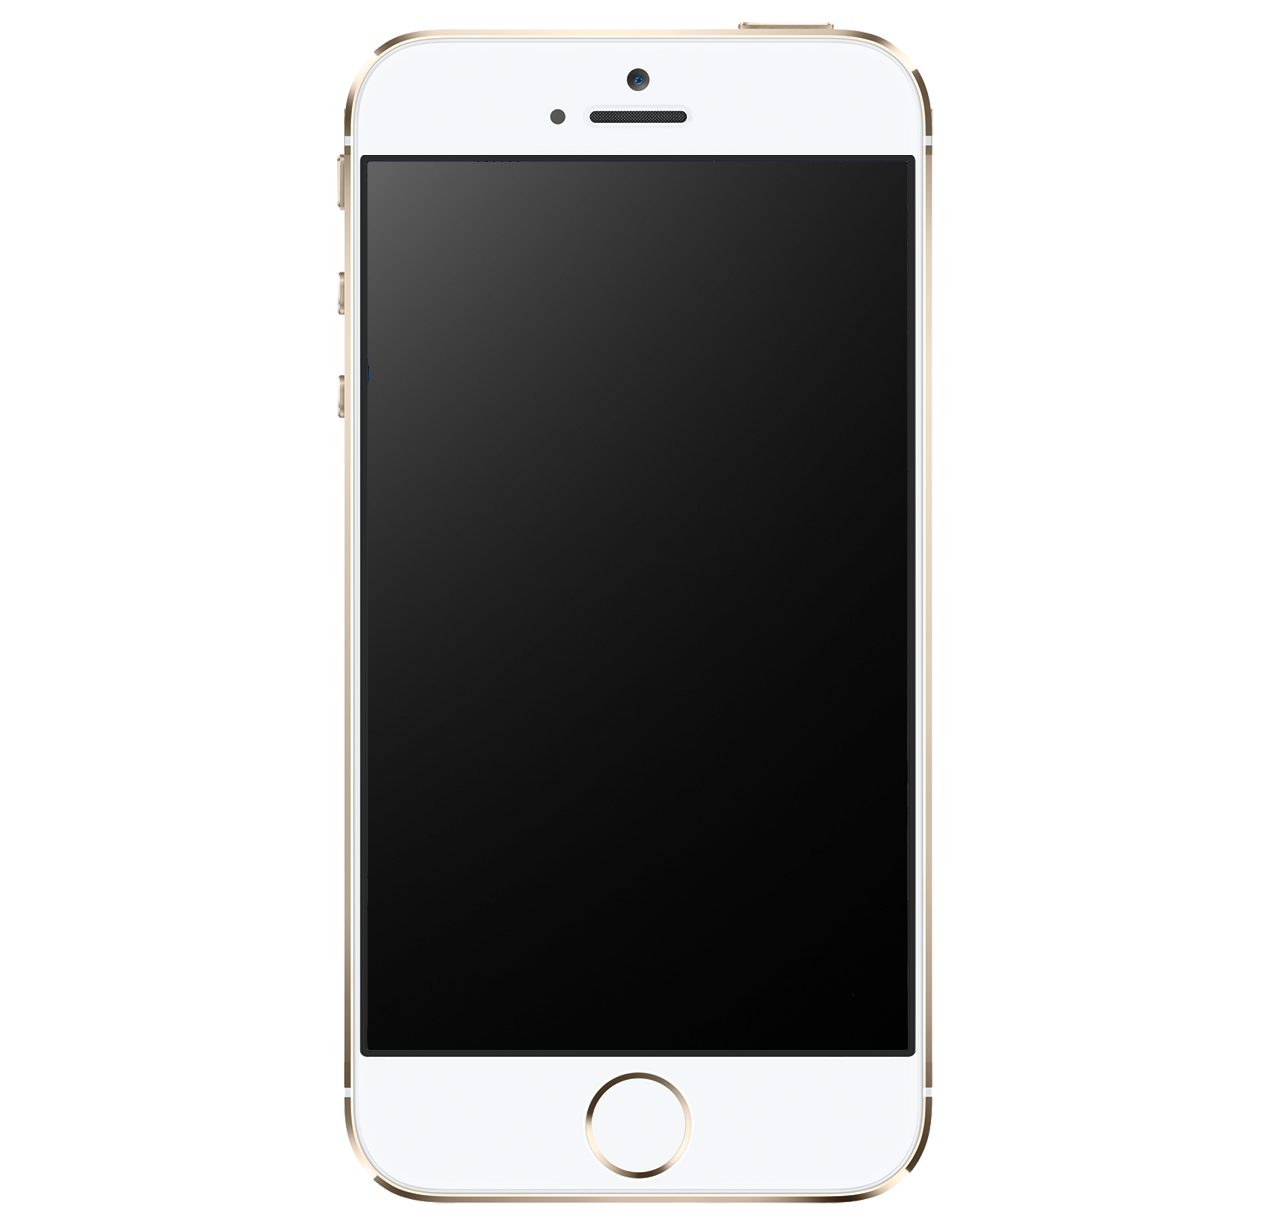 Iphone Apple PNG Image - PurePNG | Free transparent CC0 ...